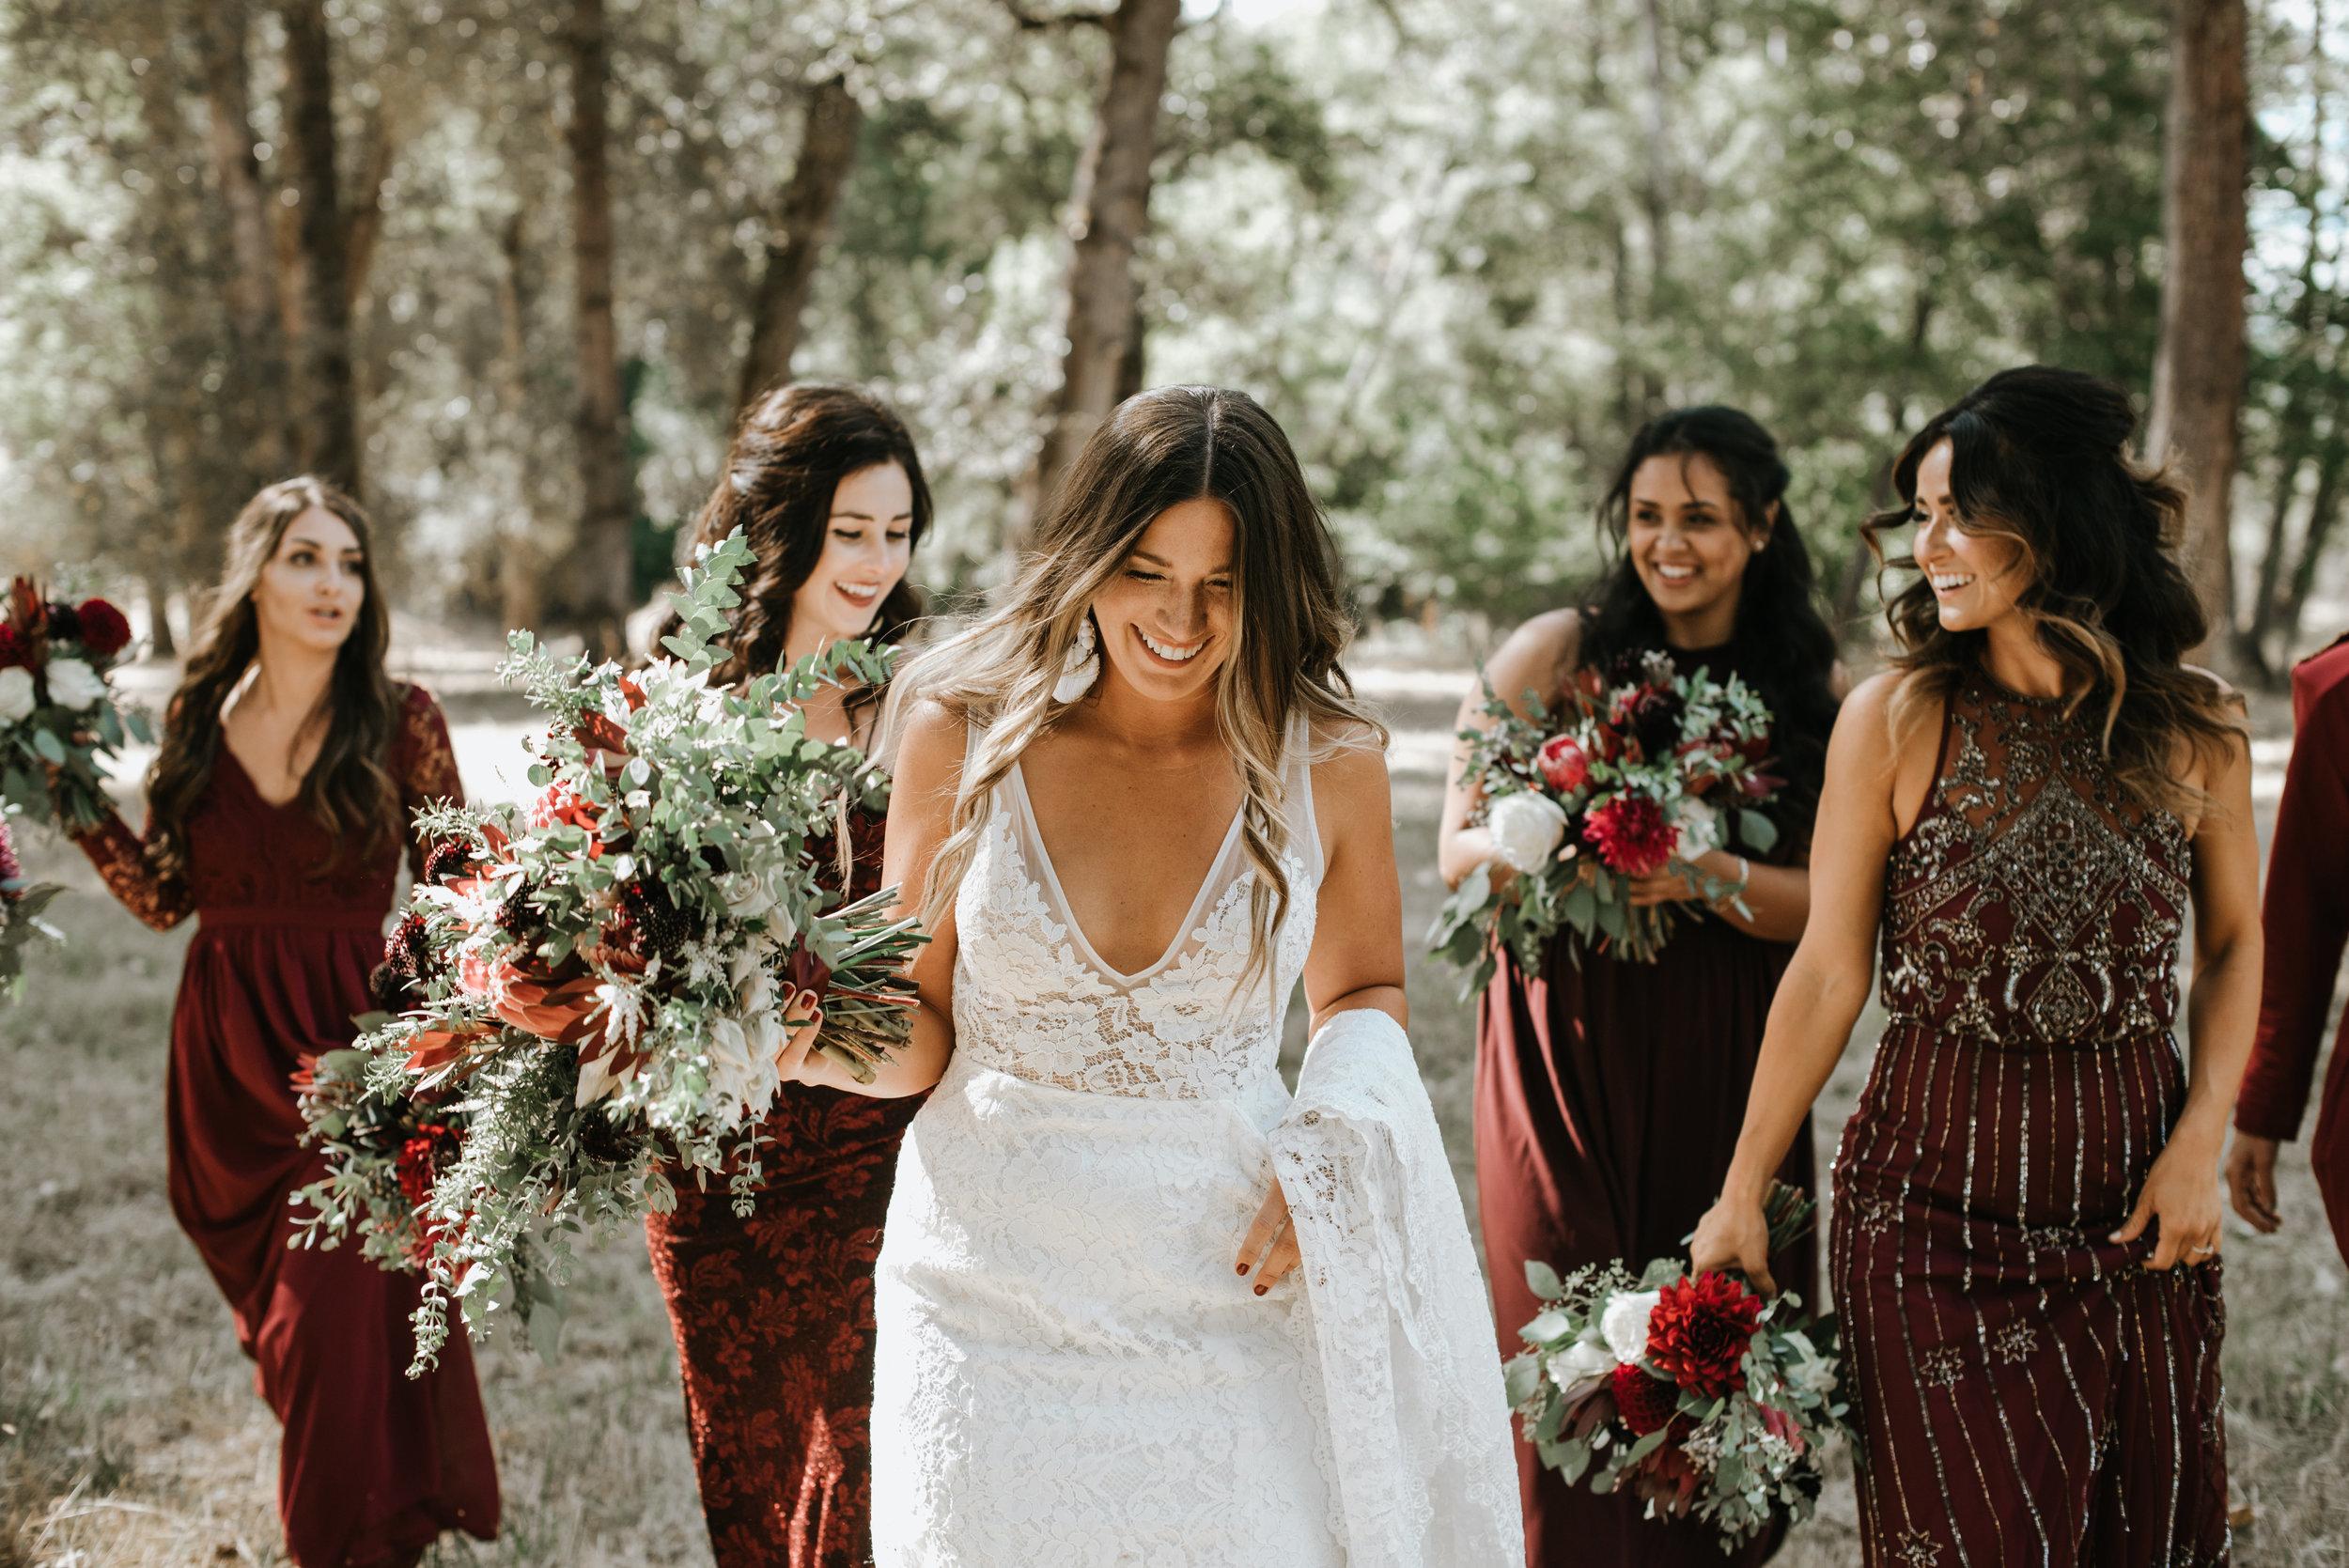 goldbeck wedding-341.jpg